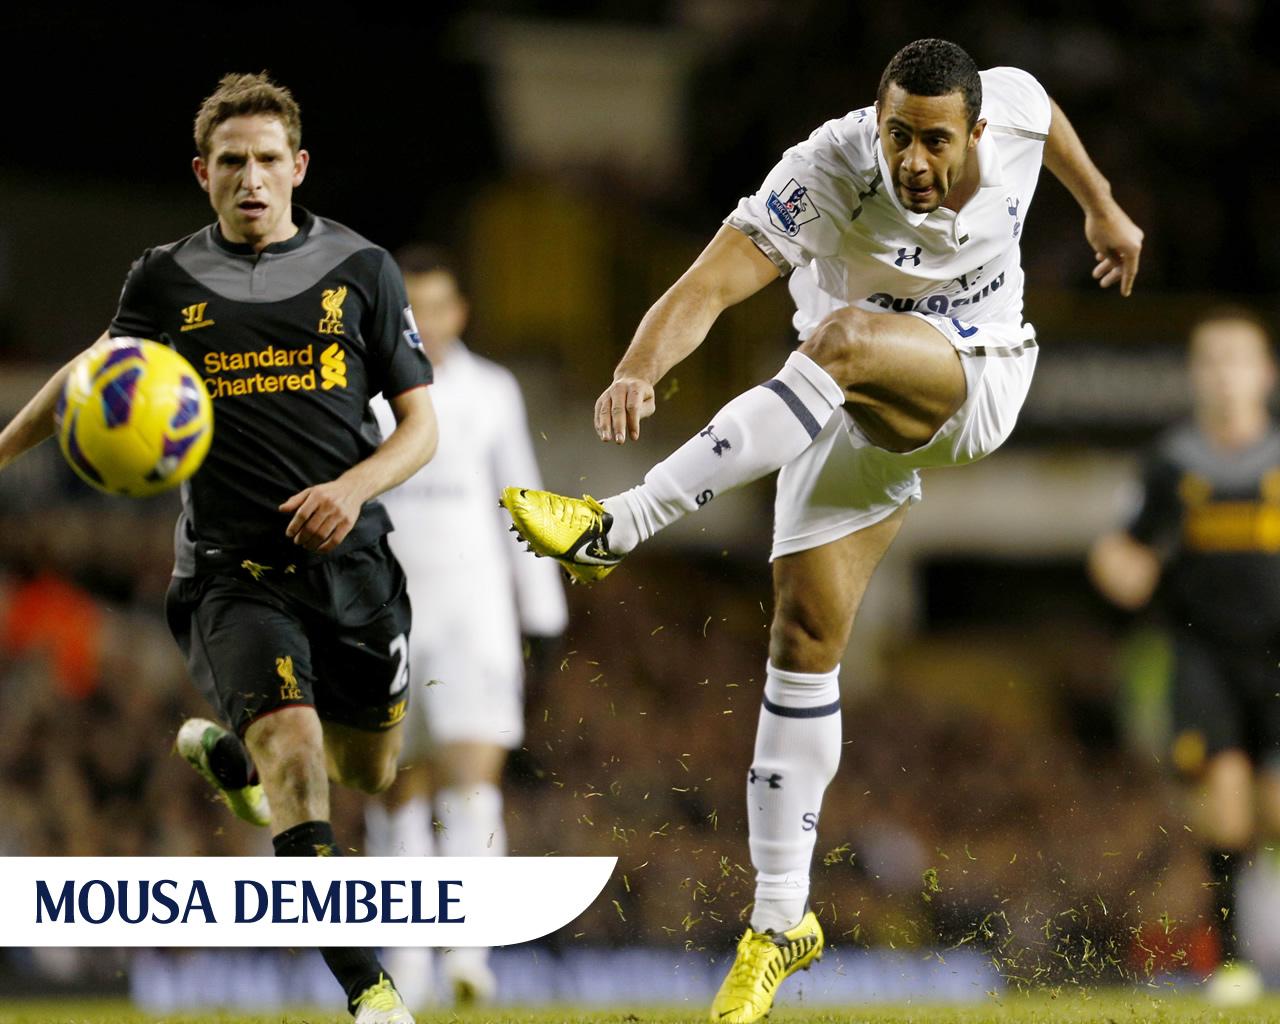 Mousa Dembele Football Wallpaper